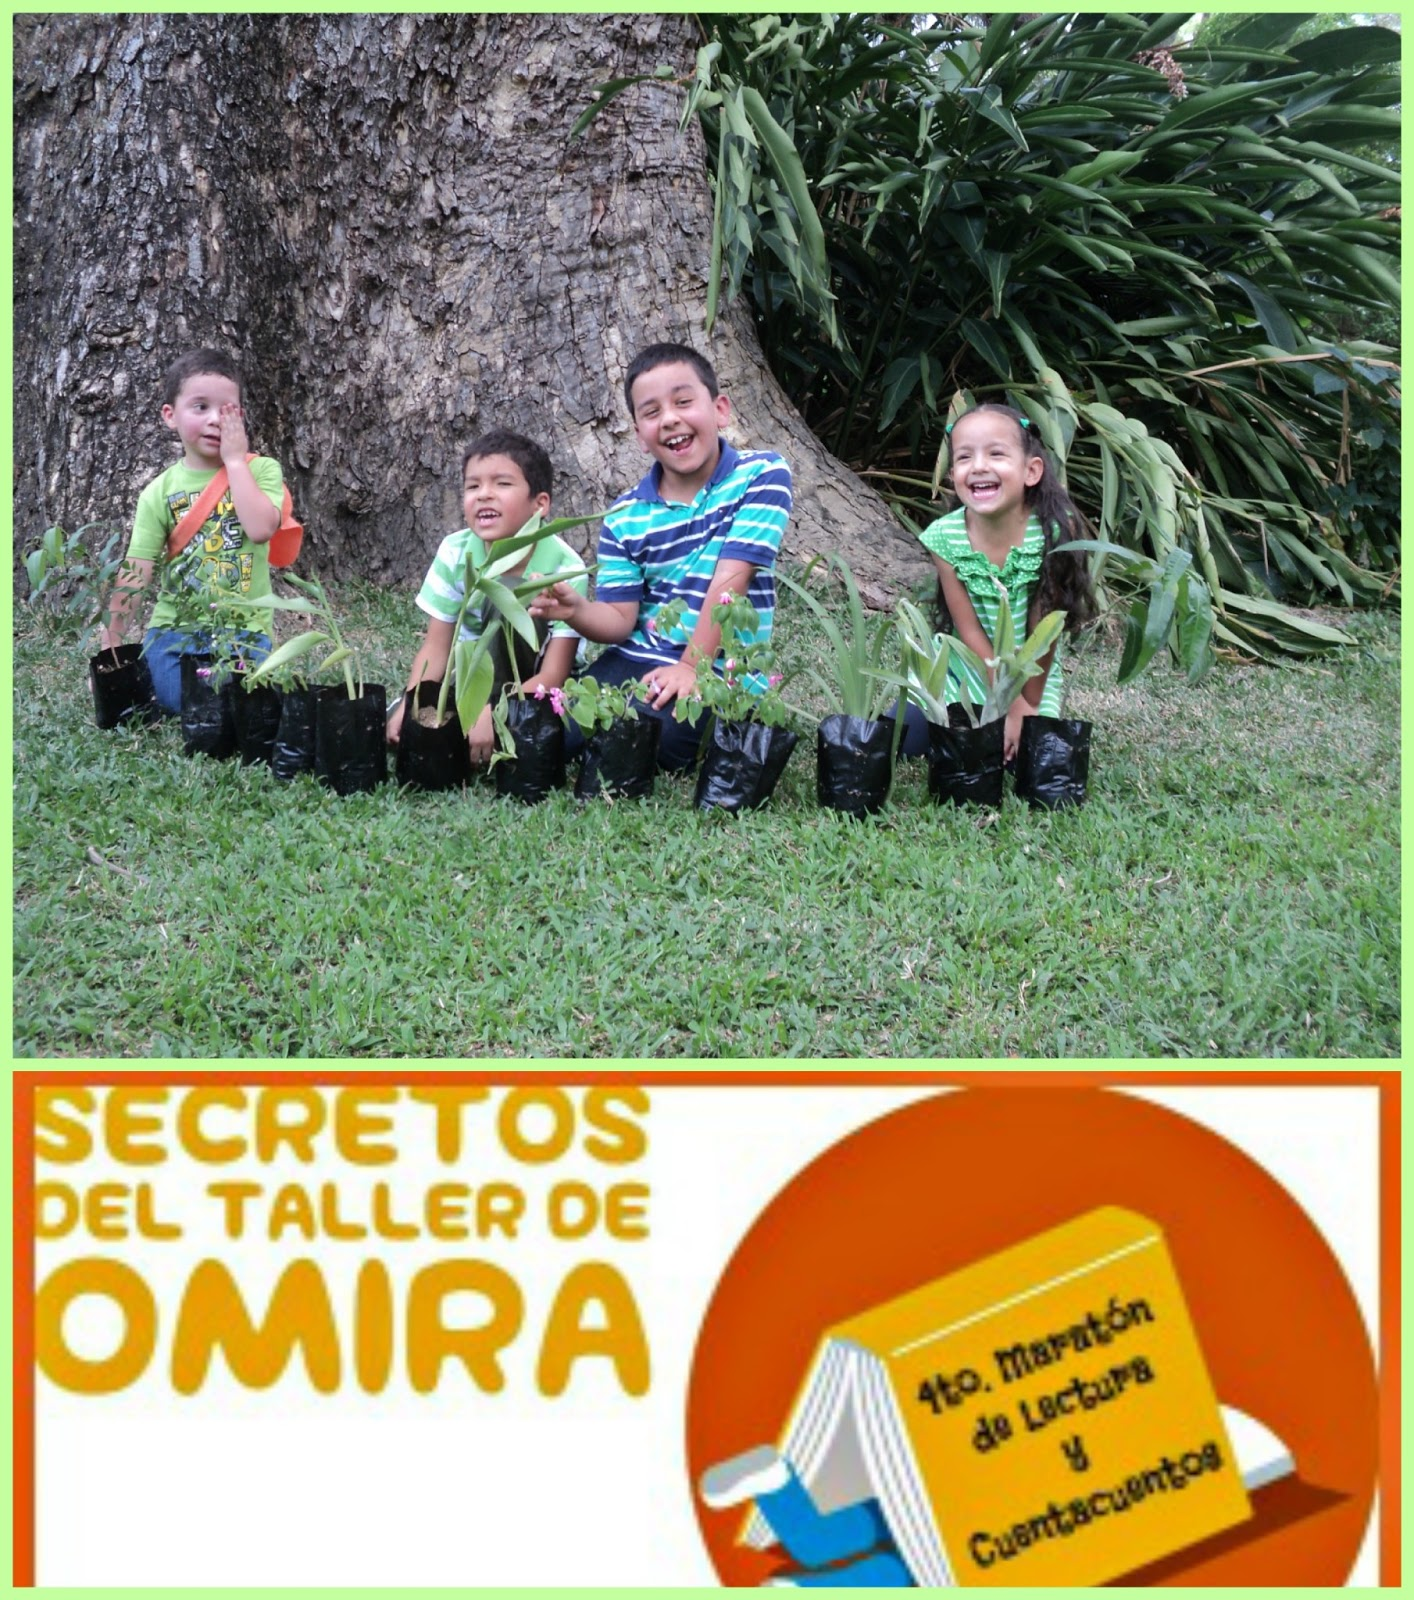 Secretos del taller de omira secretos del jard n 4to for Cancion secretos en el jardin